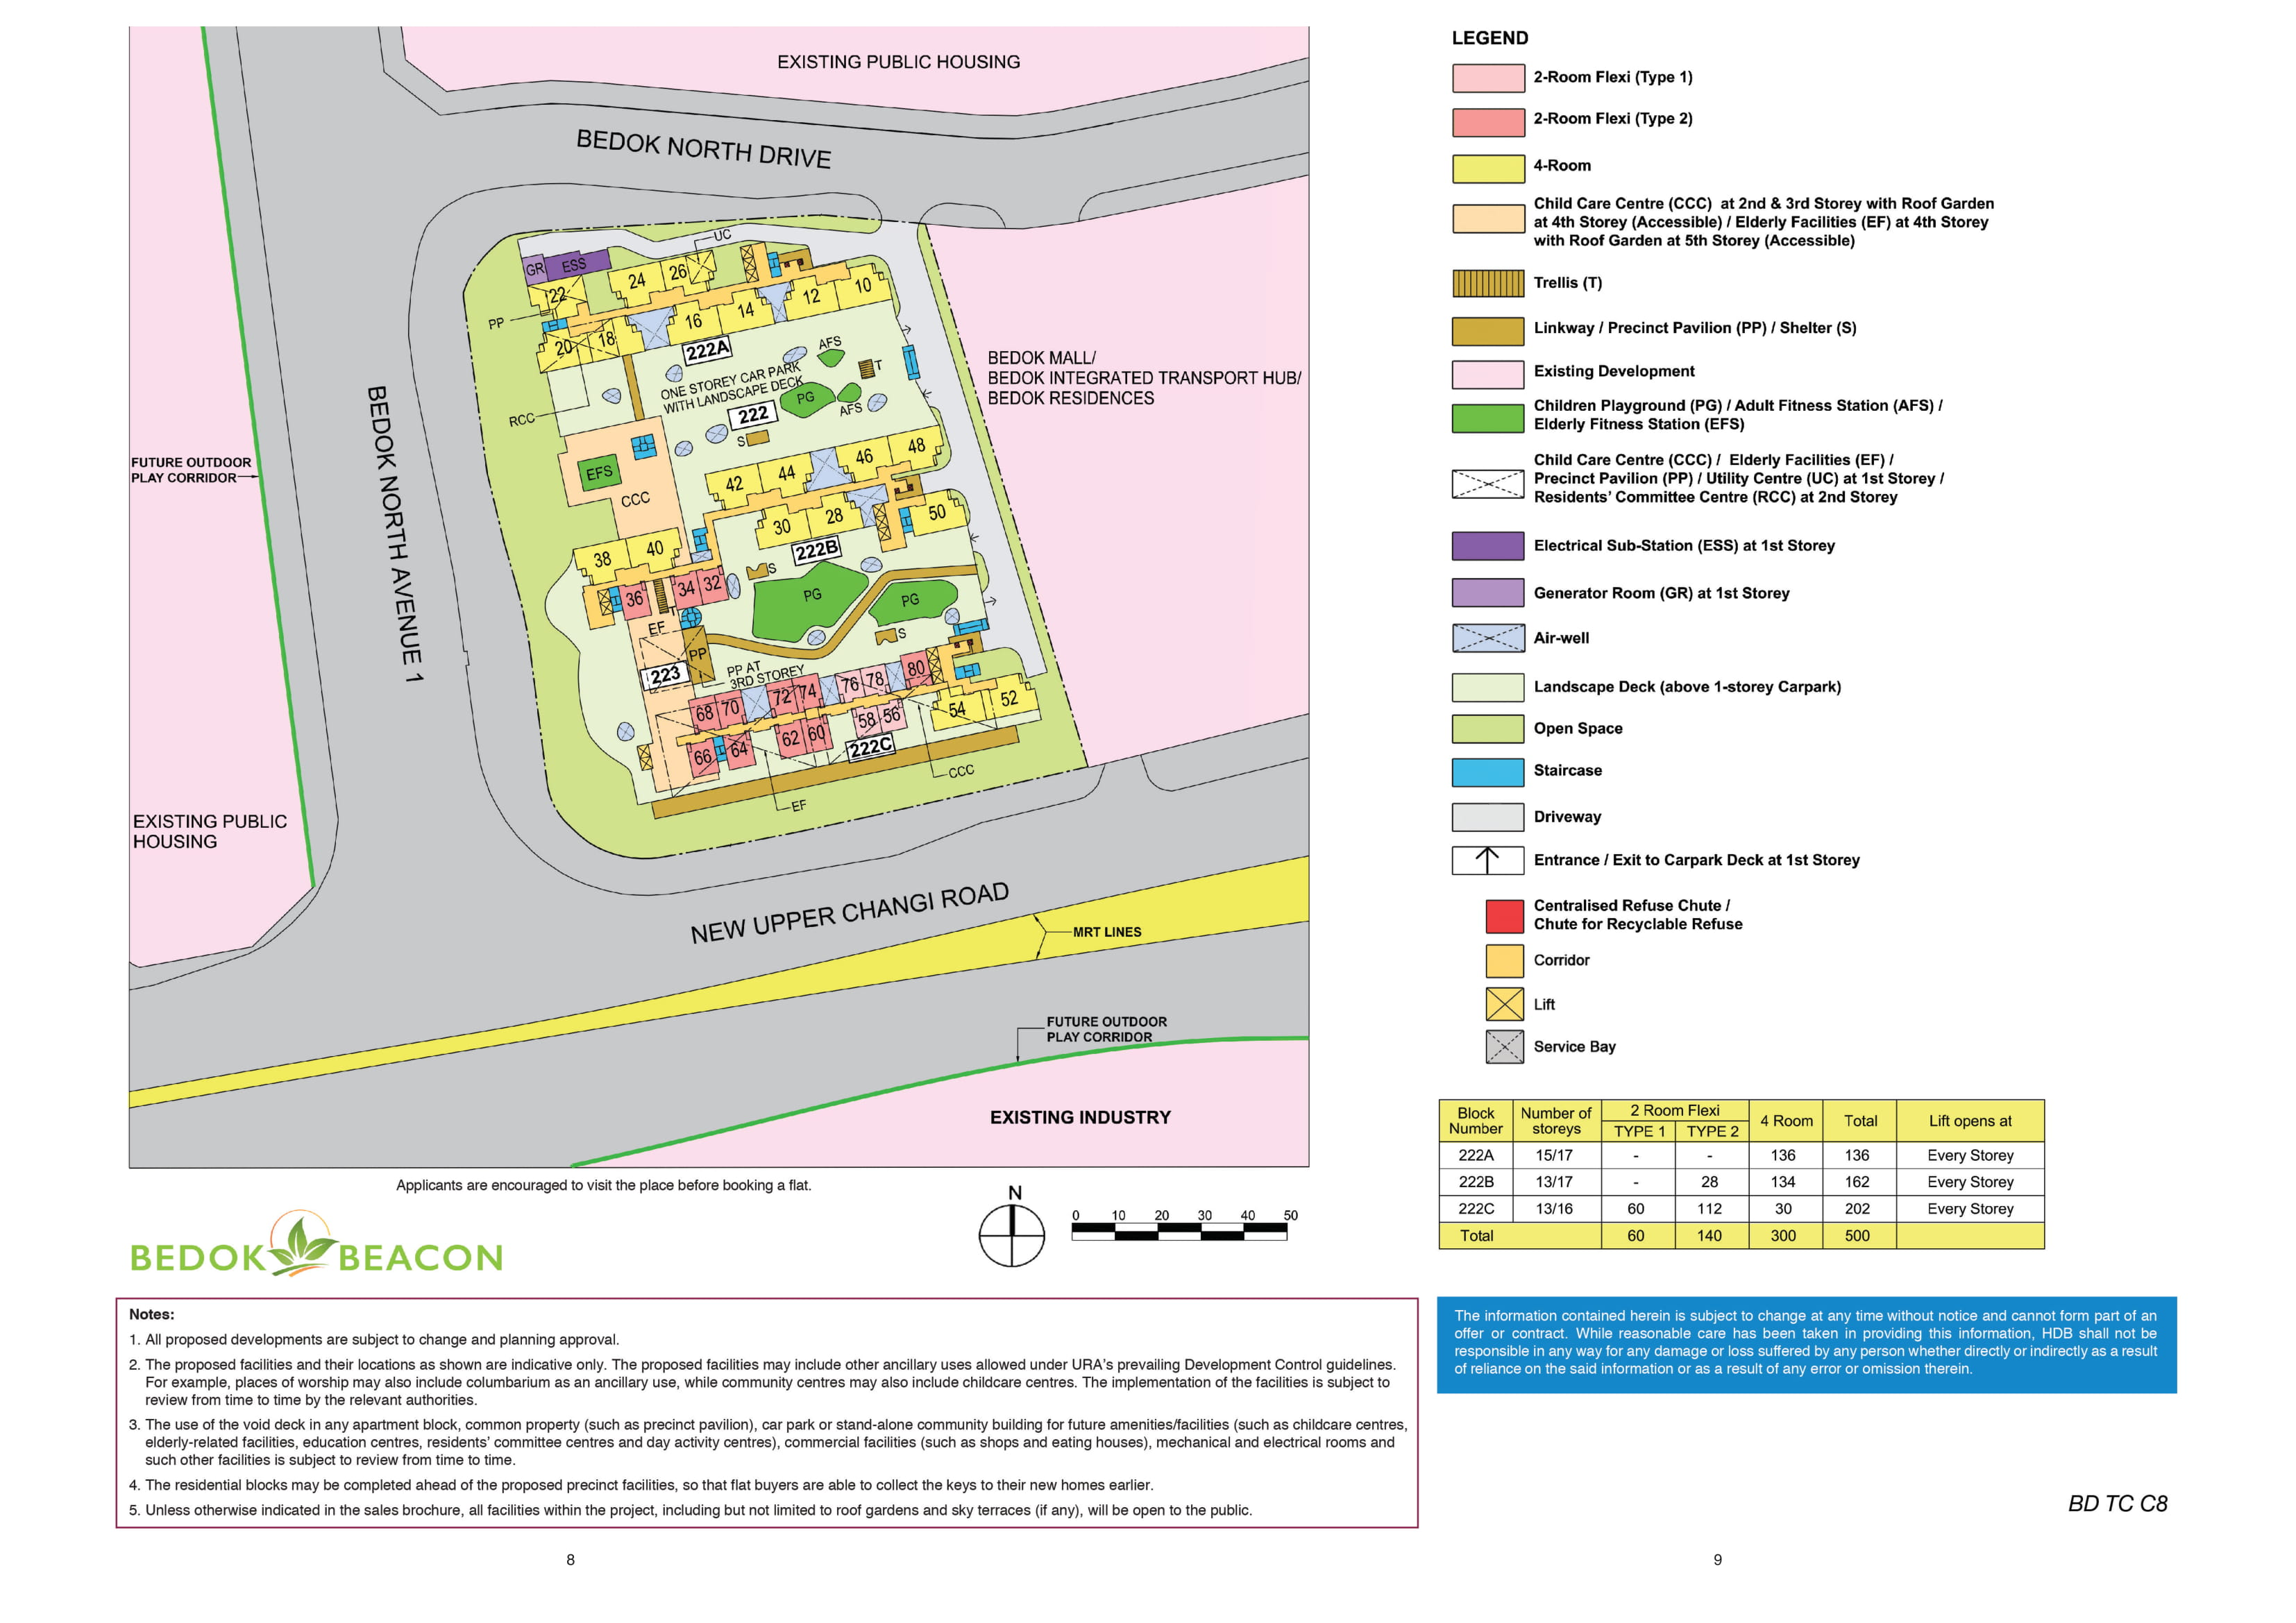 Bedok Beacon Site Plan